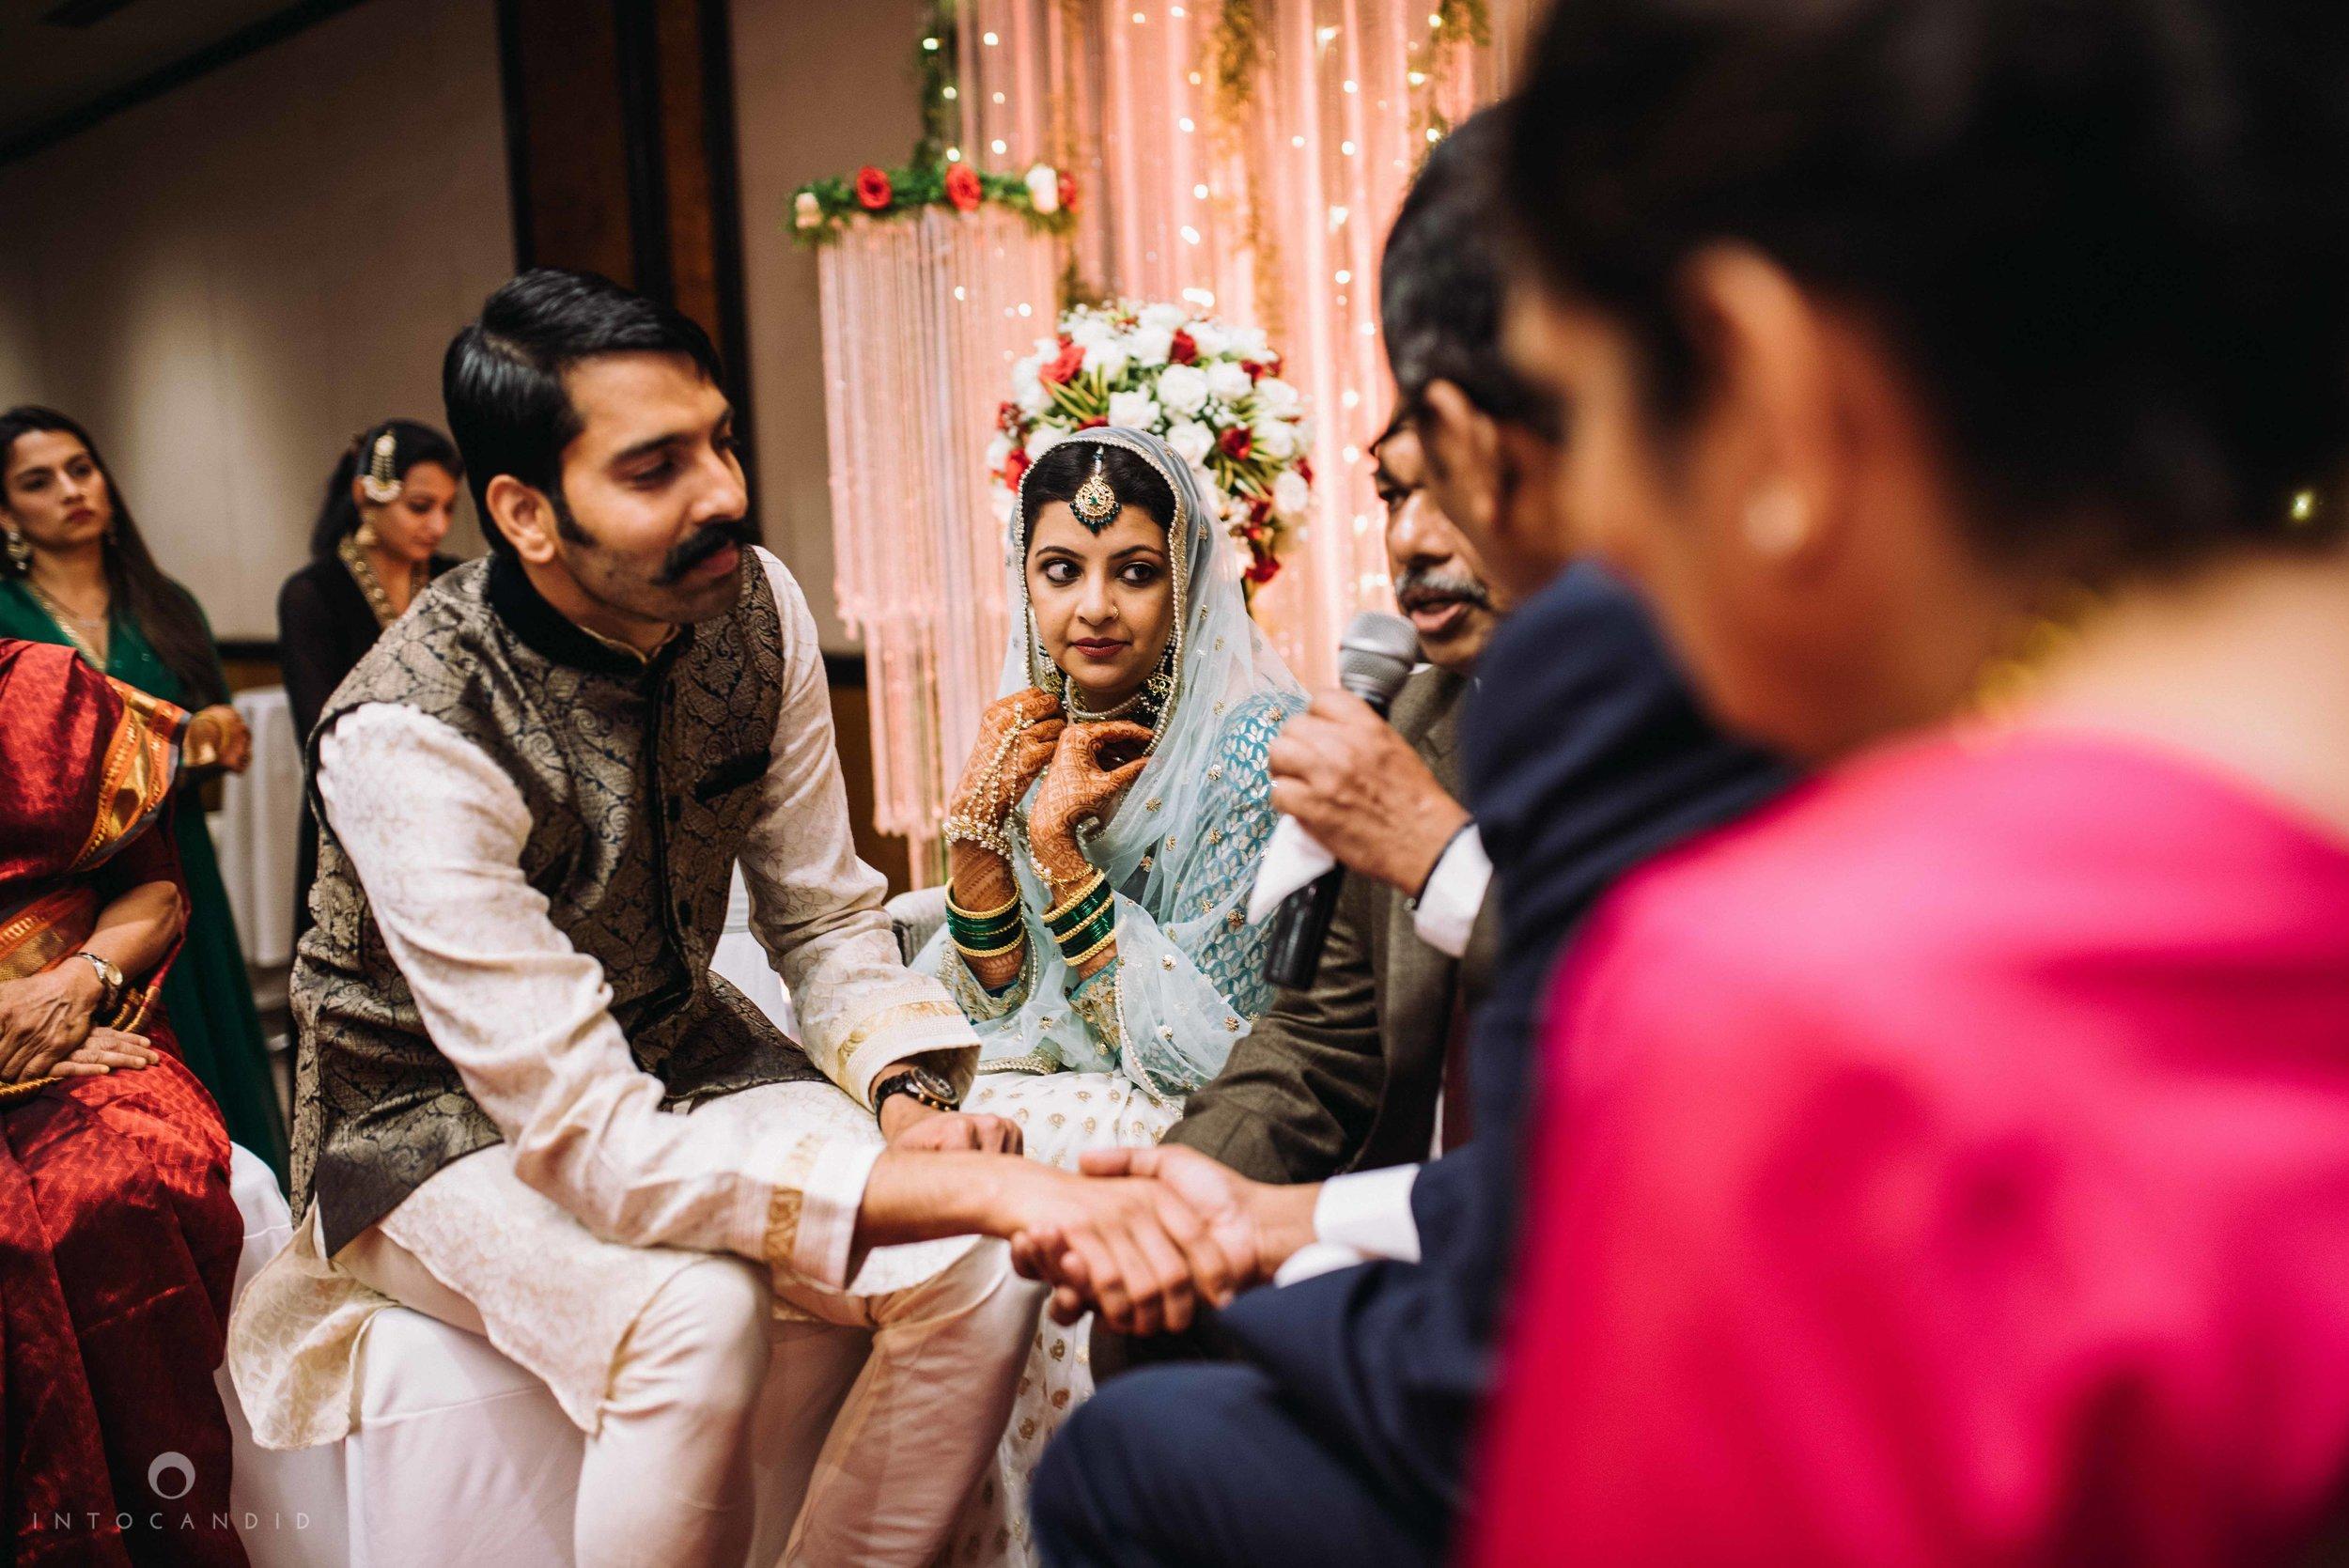 Bangalore_Wedding_Photographer_Indian_Wedding_Photography_36.jpg